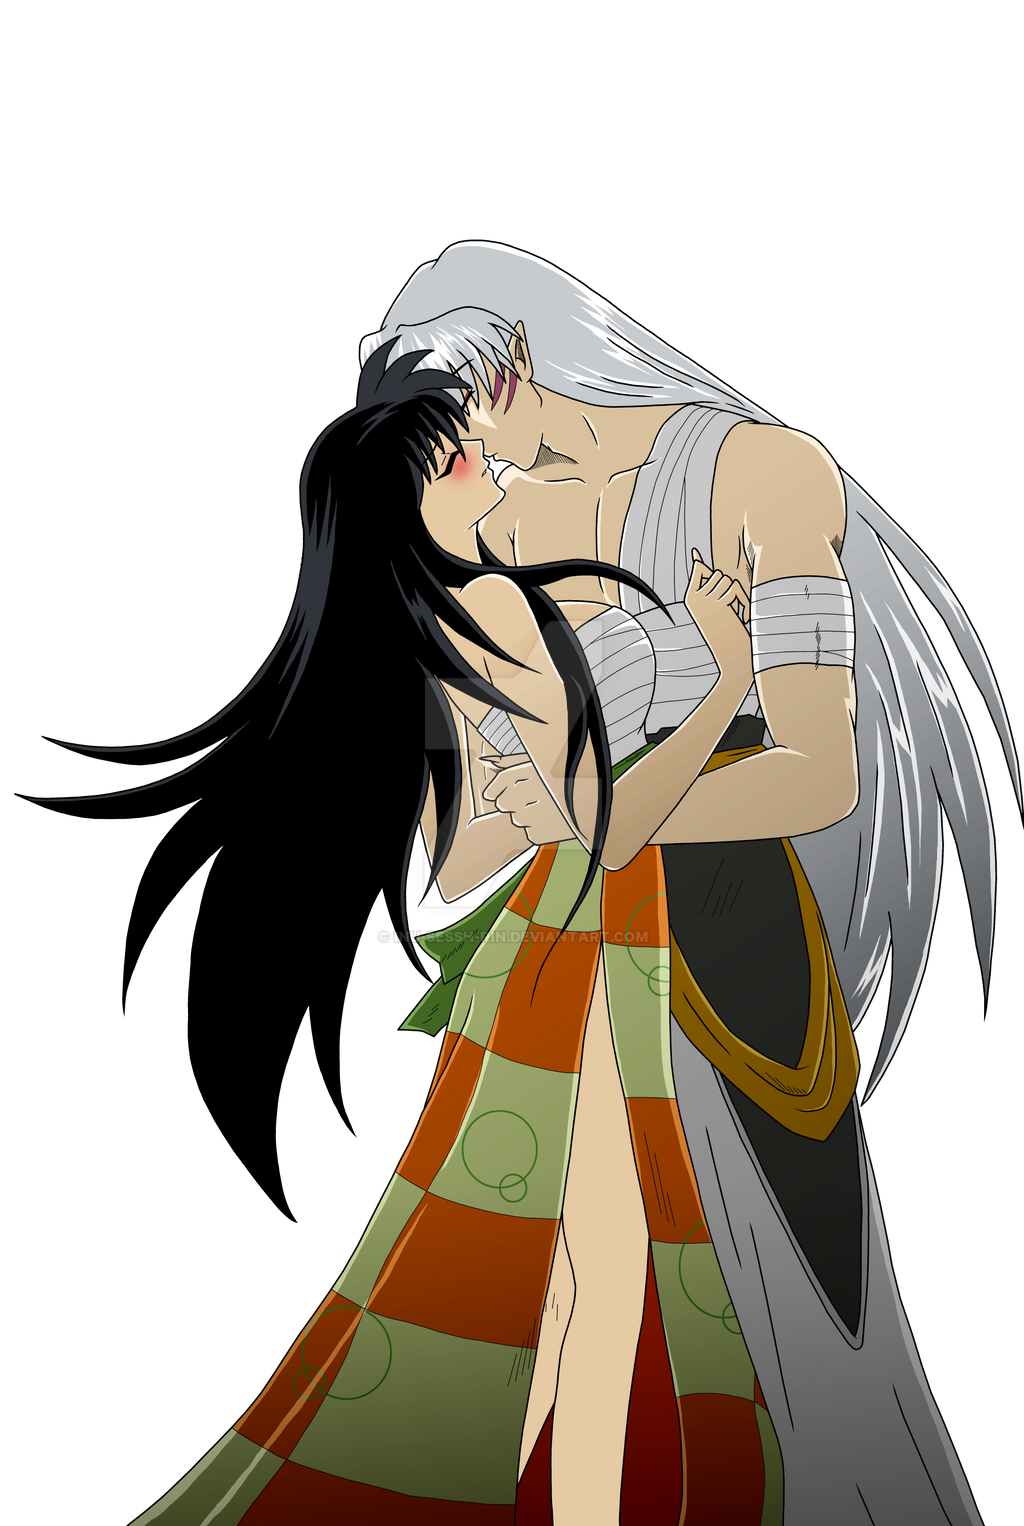 rin and sesshomaru ending a relationship